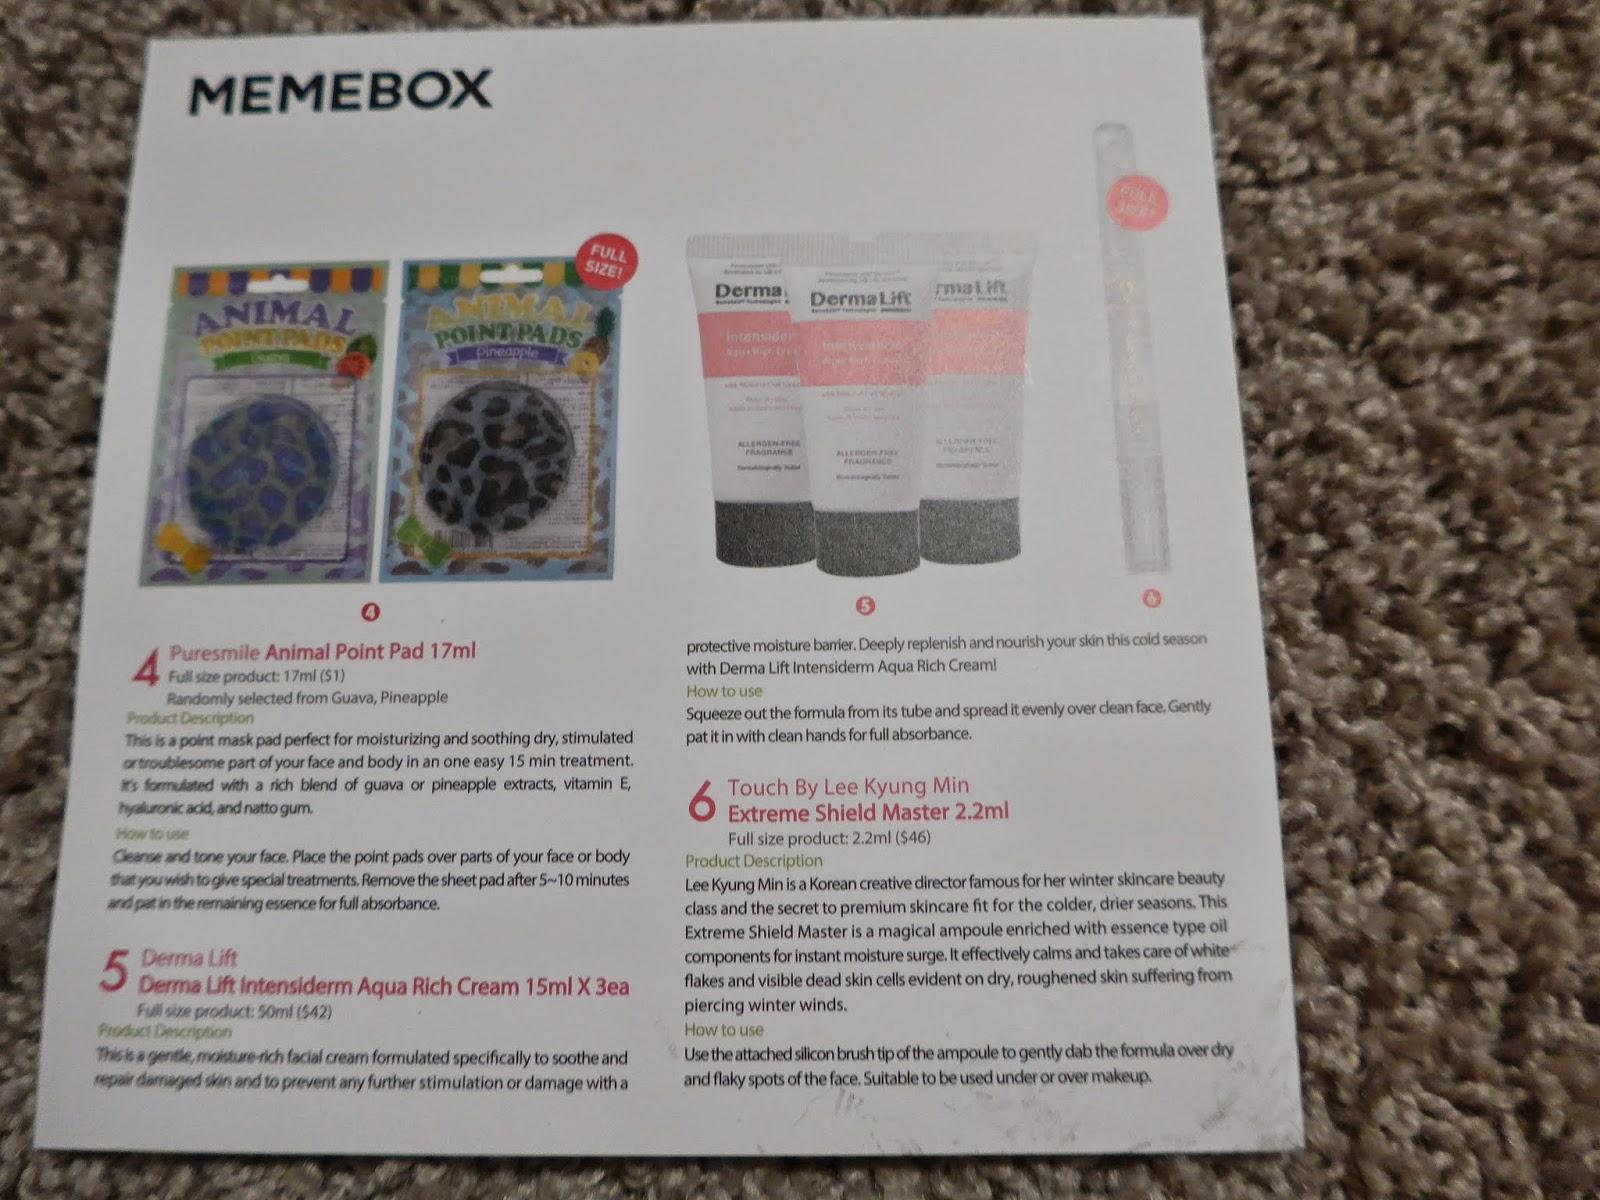 Memebox coupon code